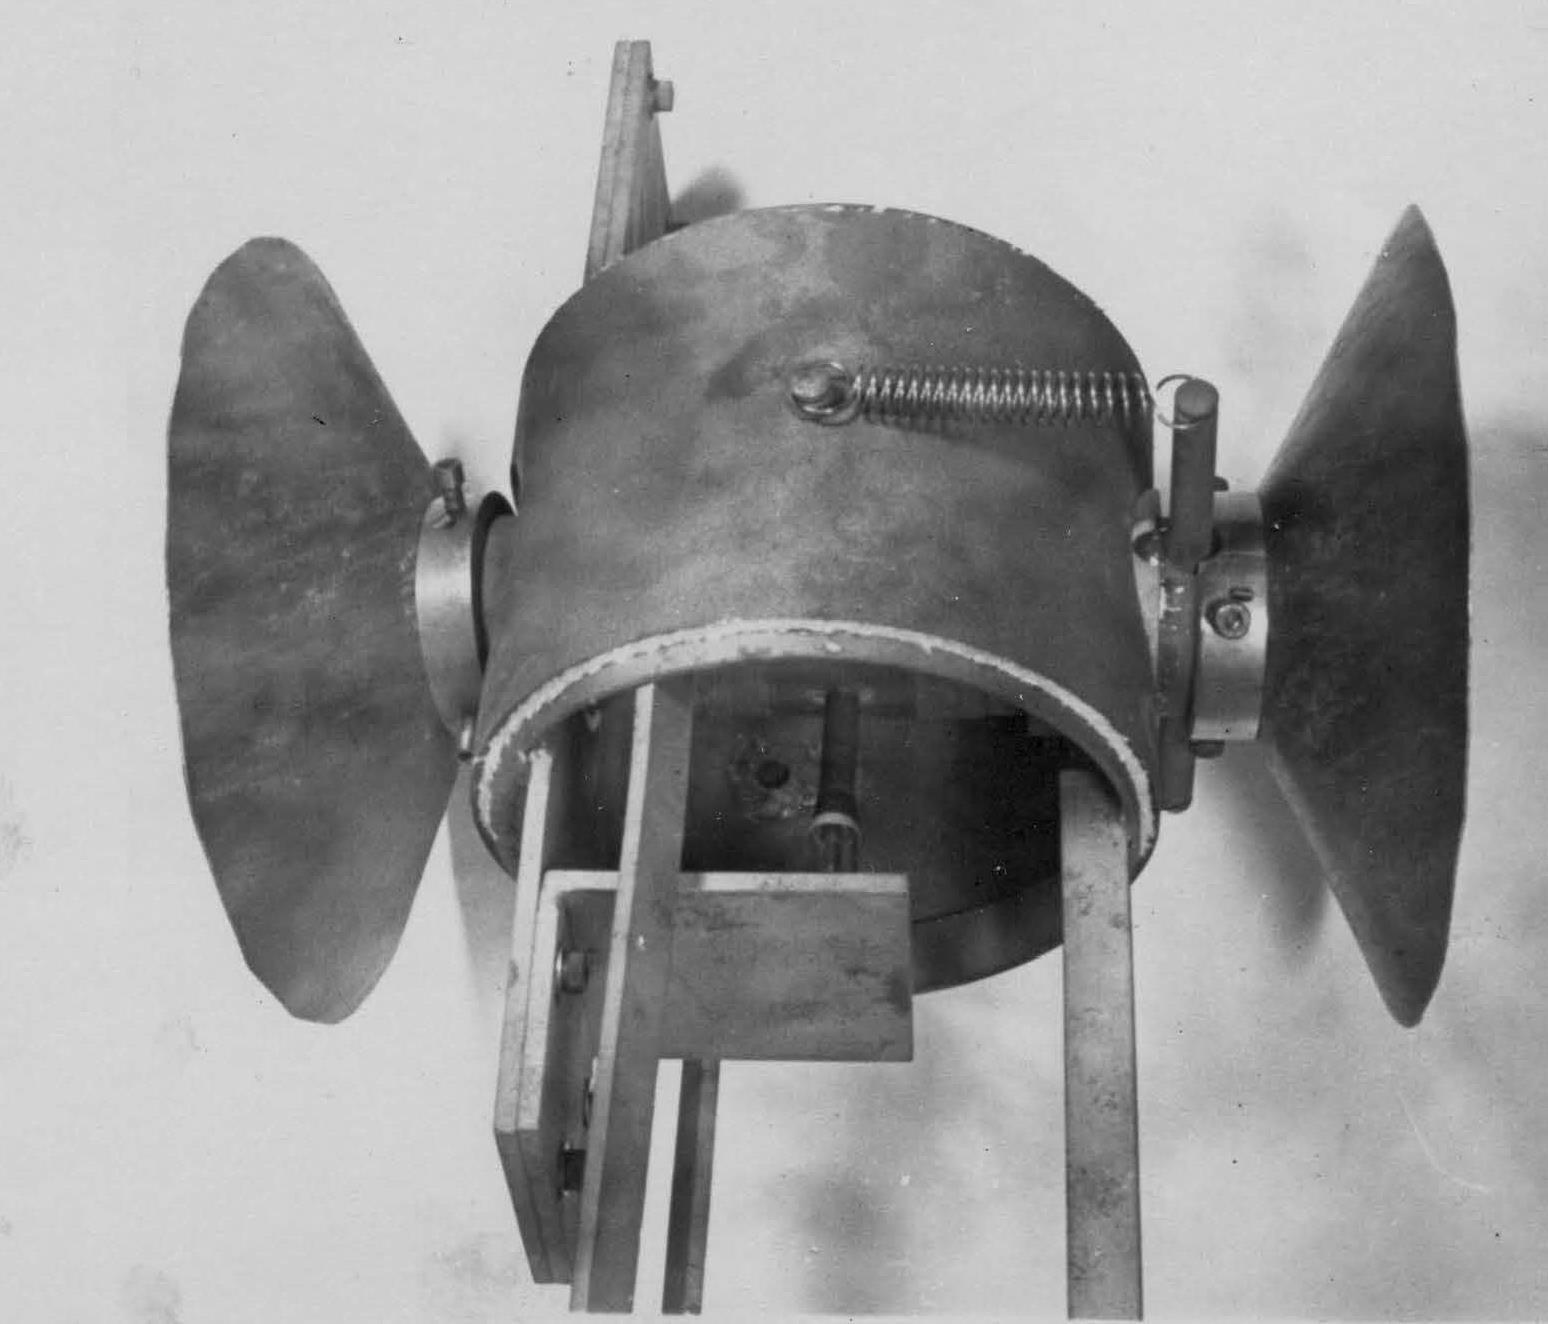 Goede Radar: Manufacturing of experimental magnetrons (1953 - 1955 ZD-13